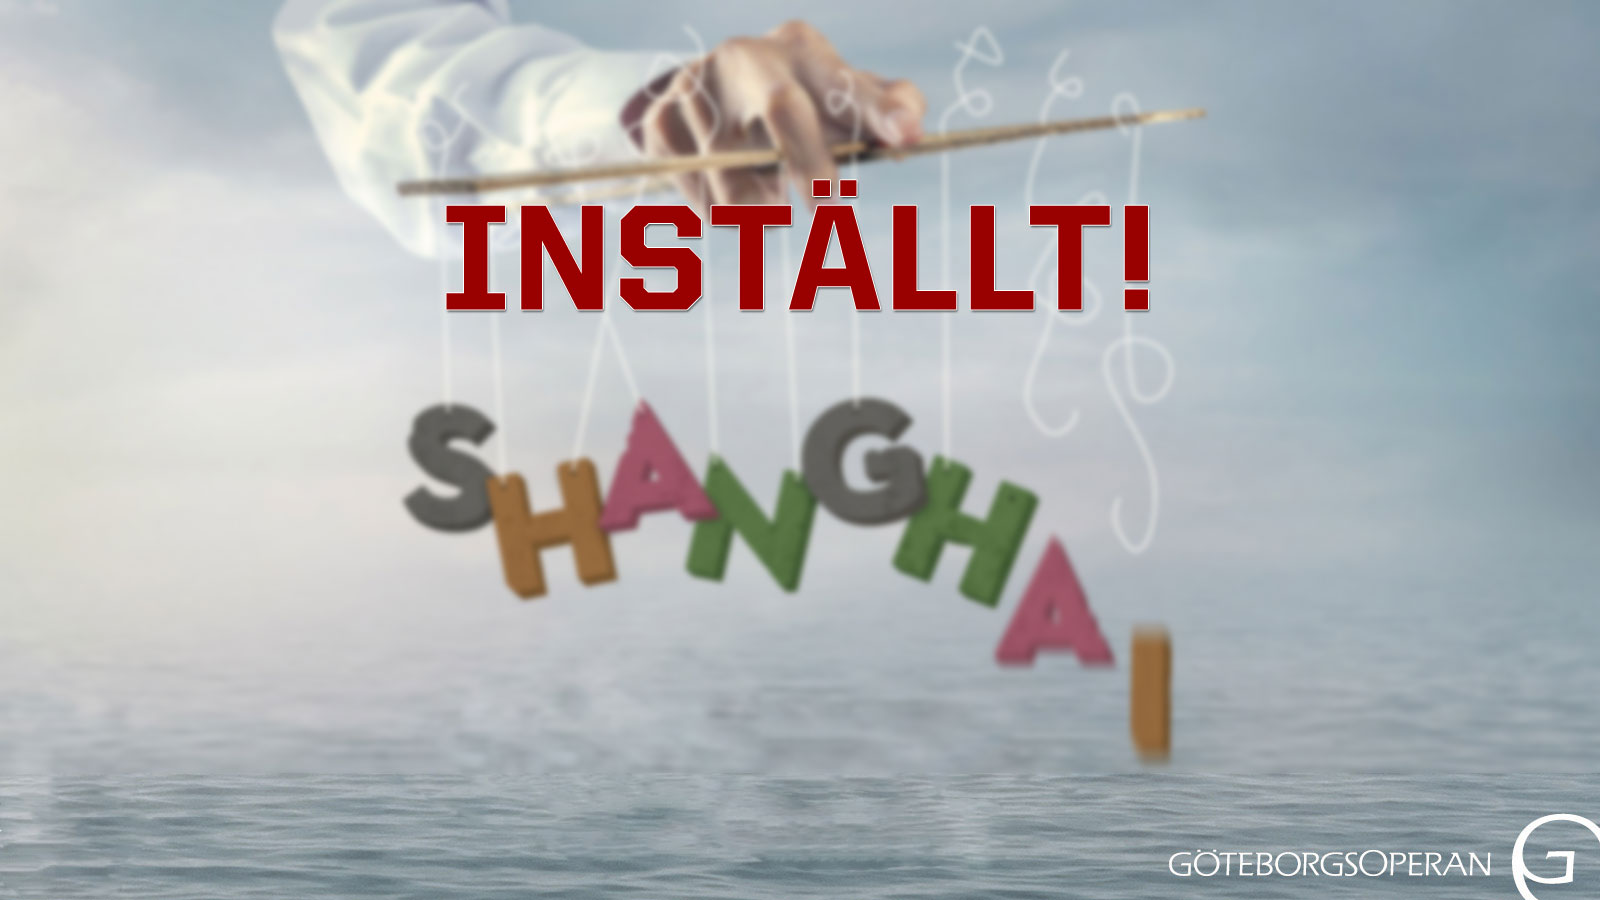 Shanghai Installt 1600x900